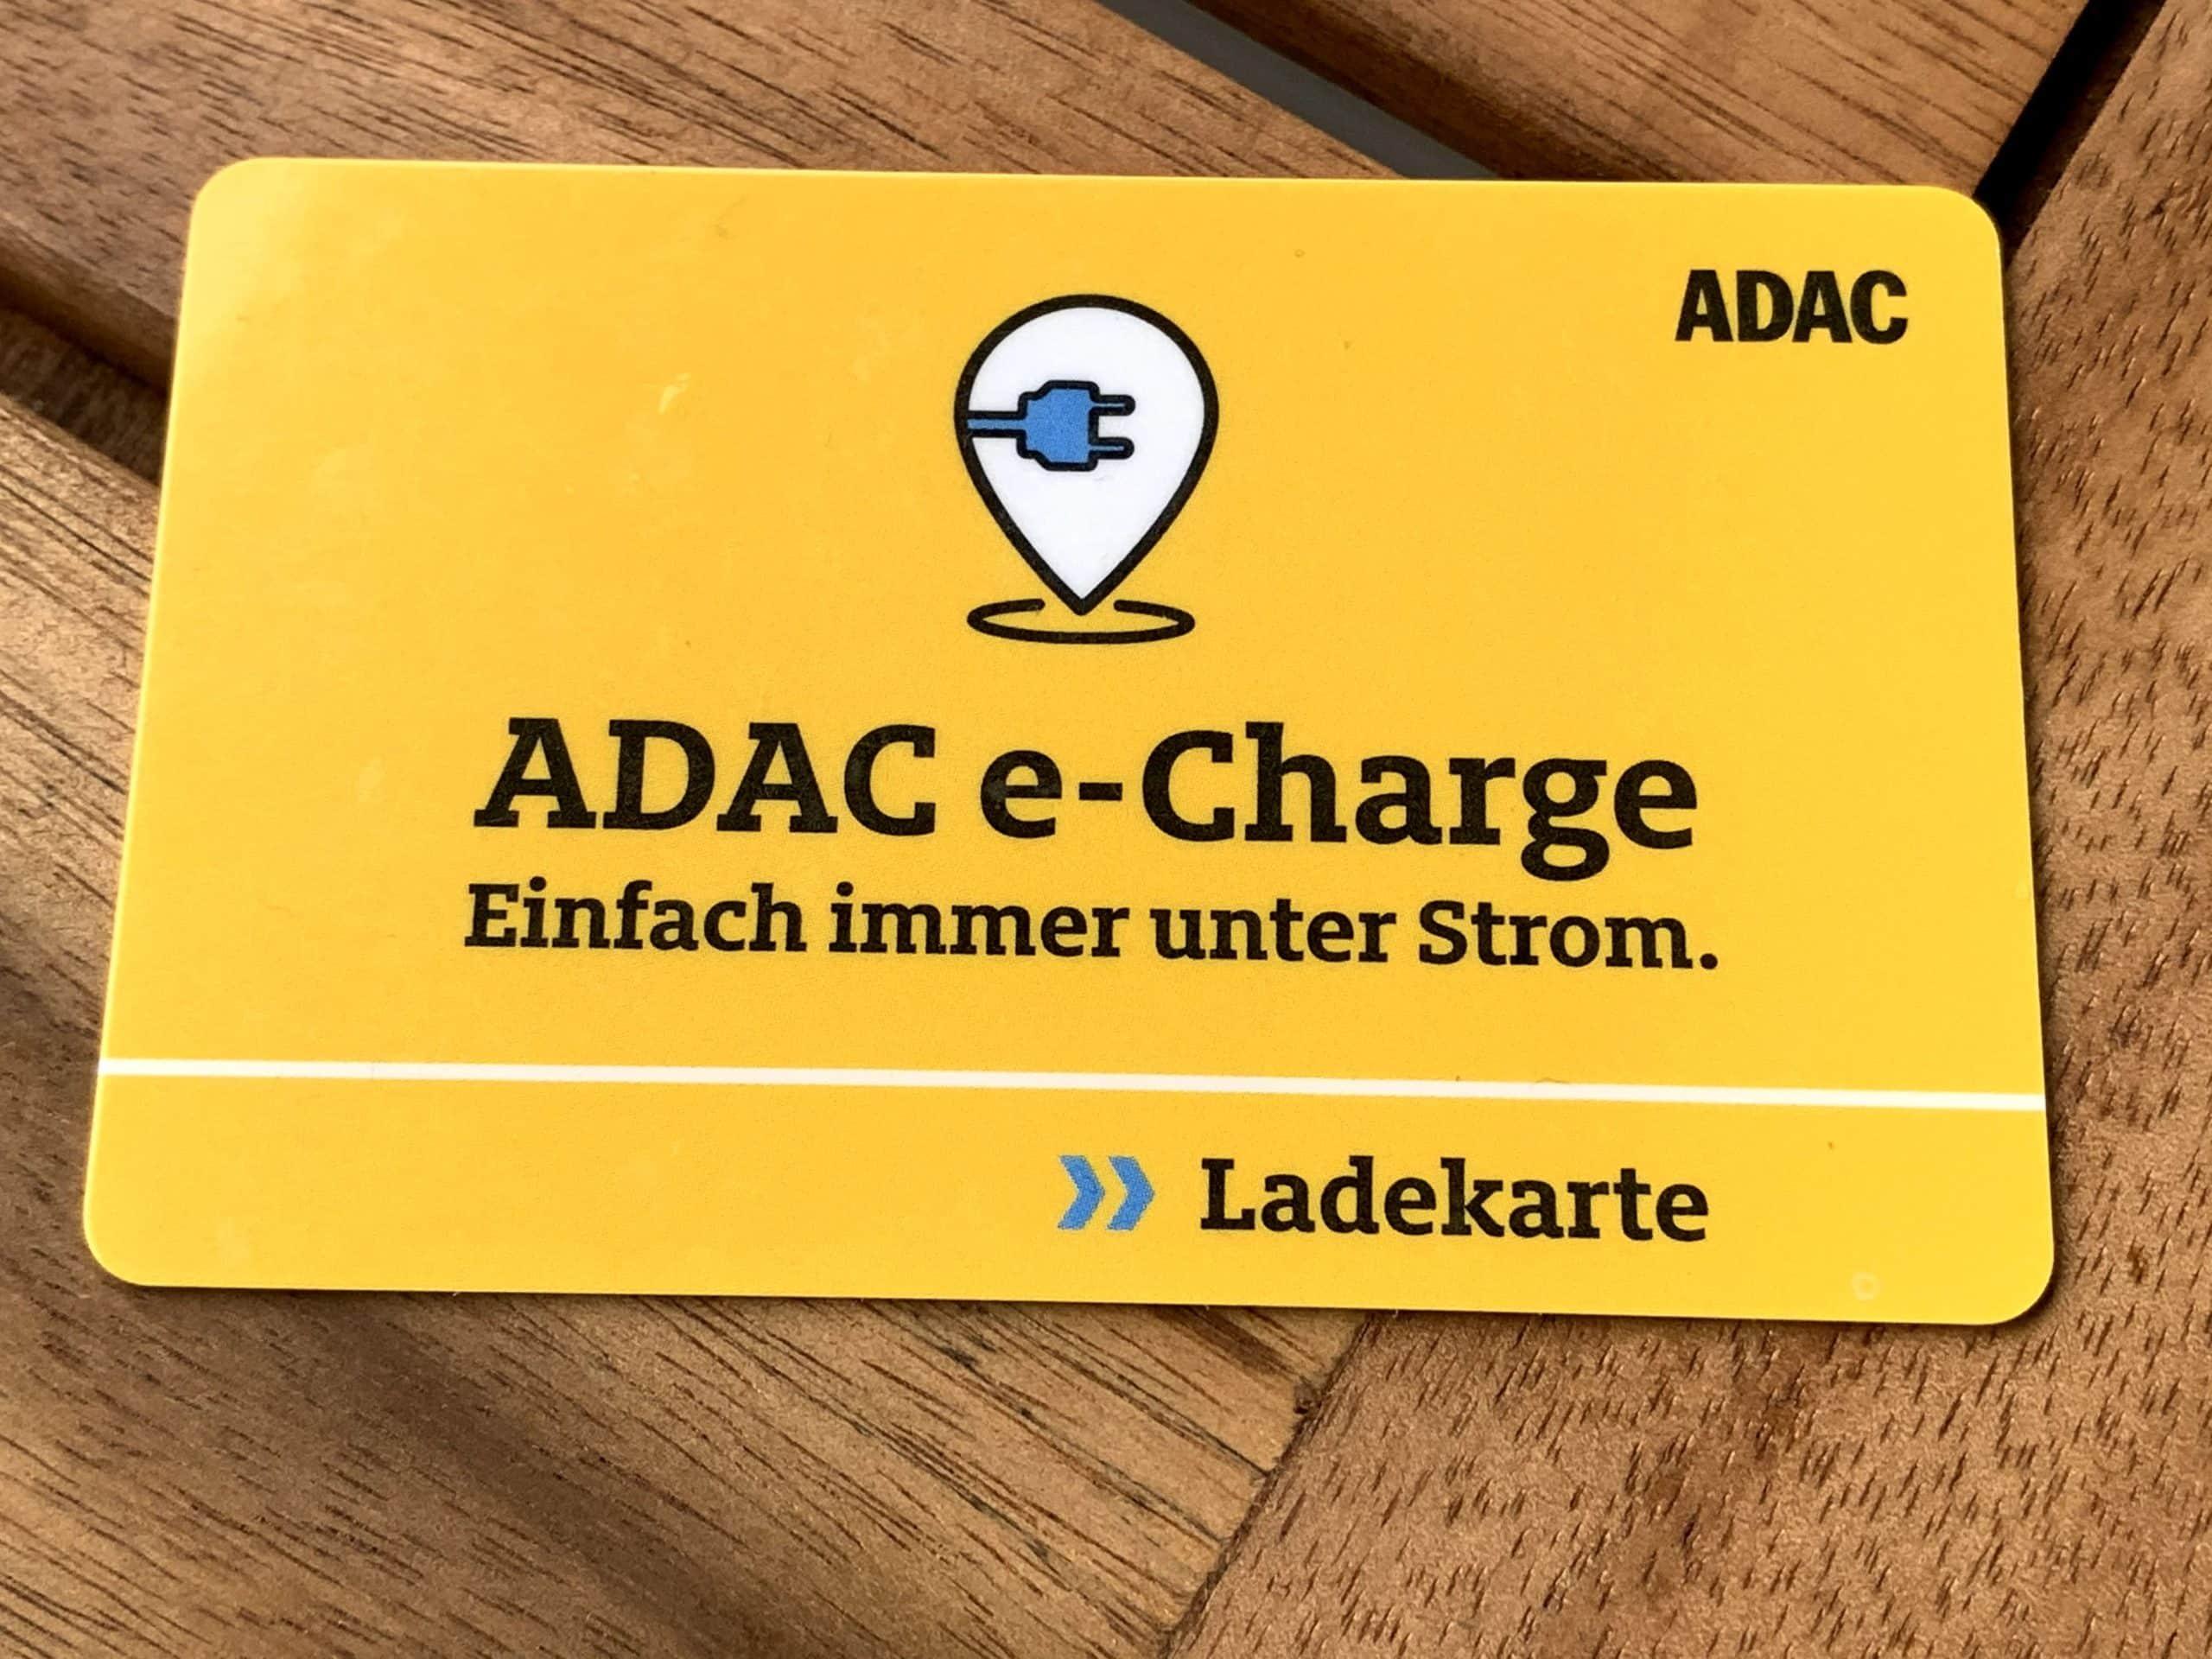 ADAC e-Charge Ladekarte